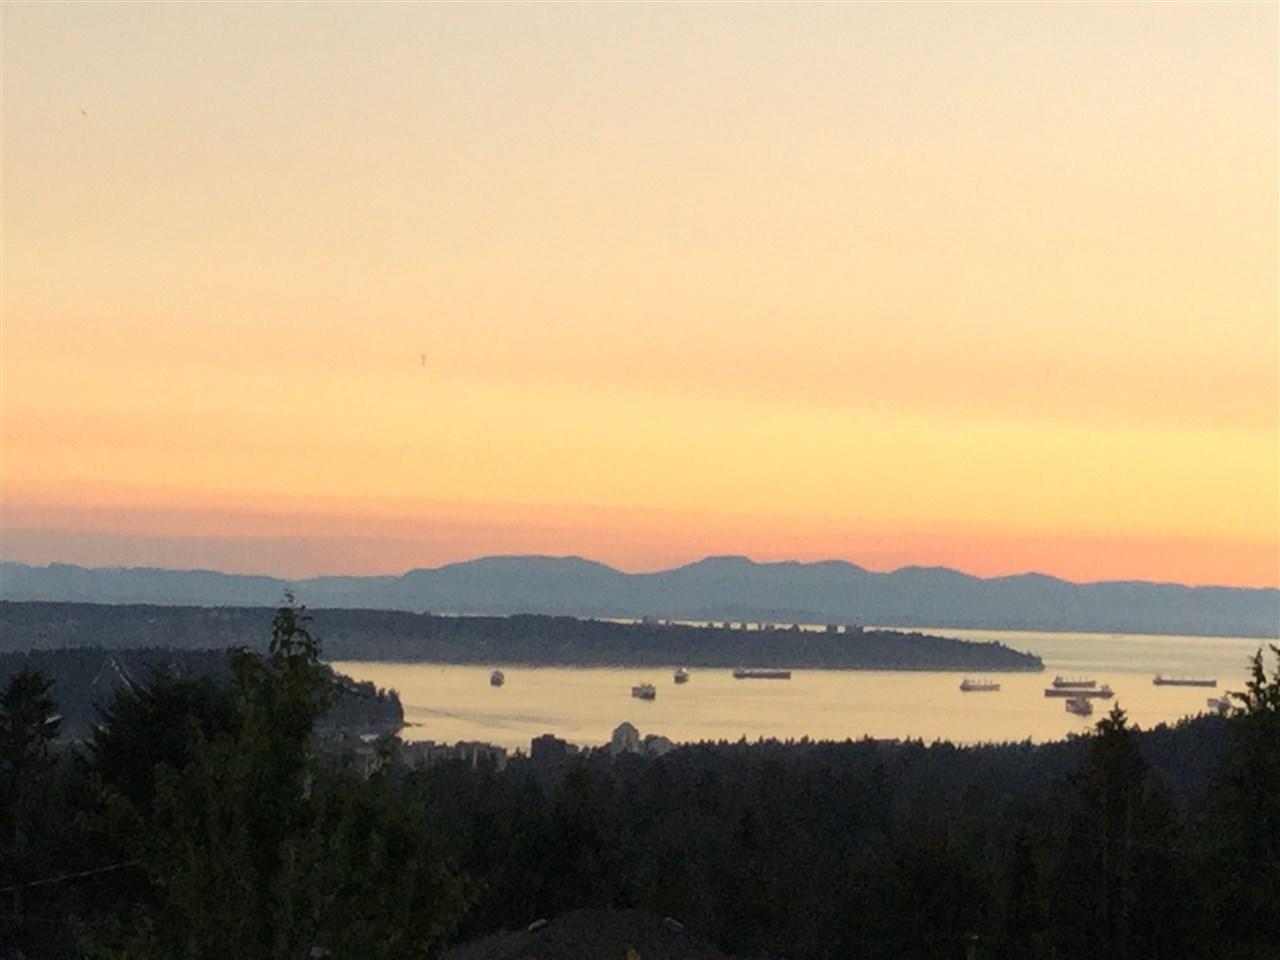 4593 SKYLINE DRIVE, North Vancouver, BC V7R 3H5